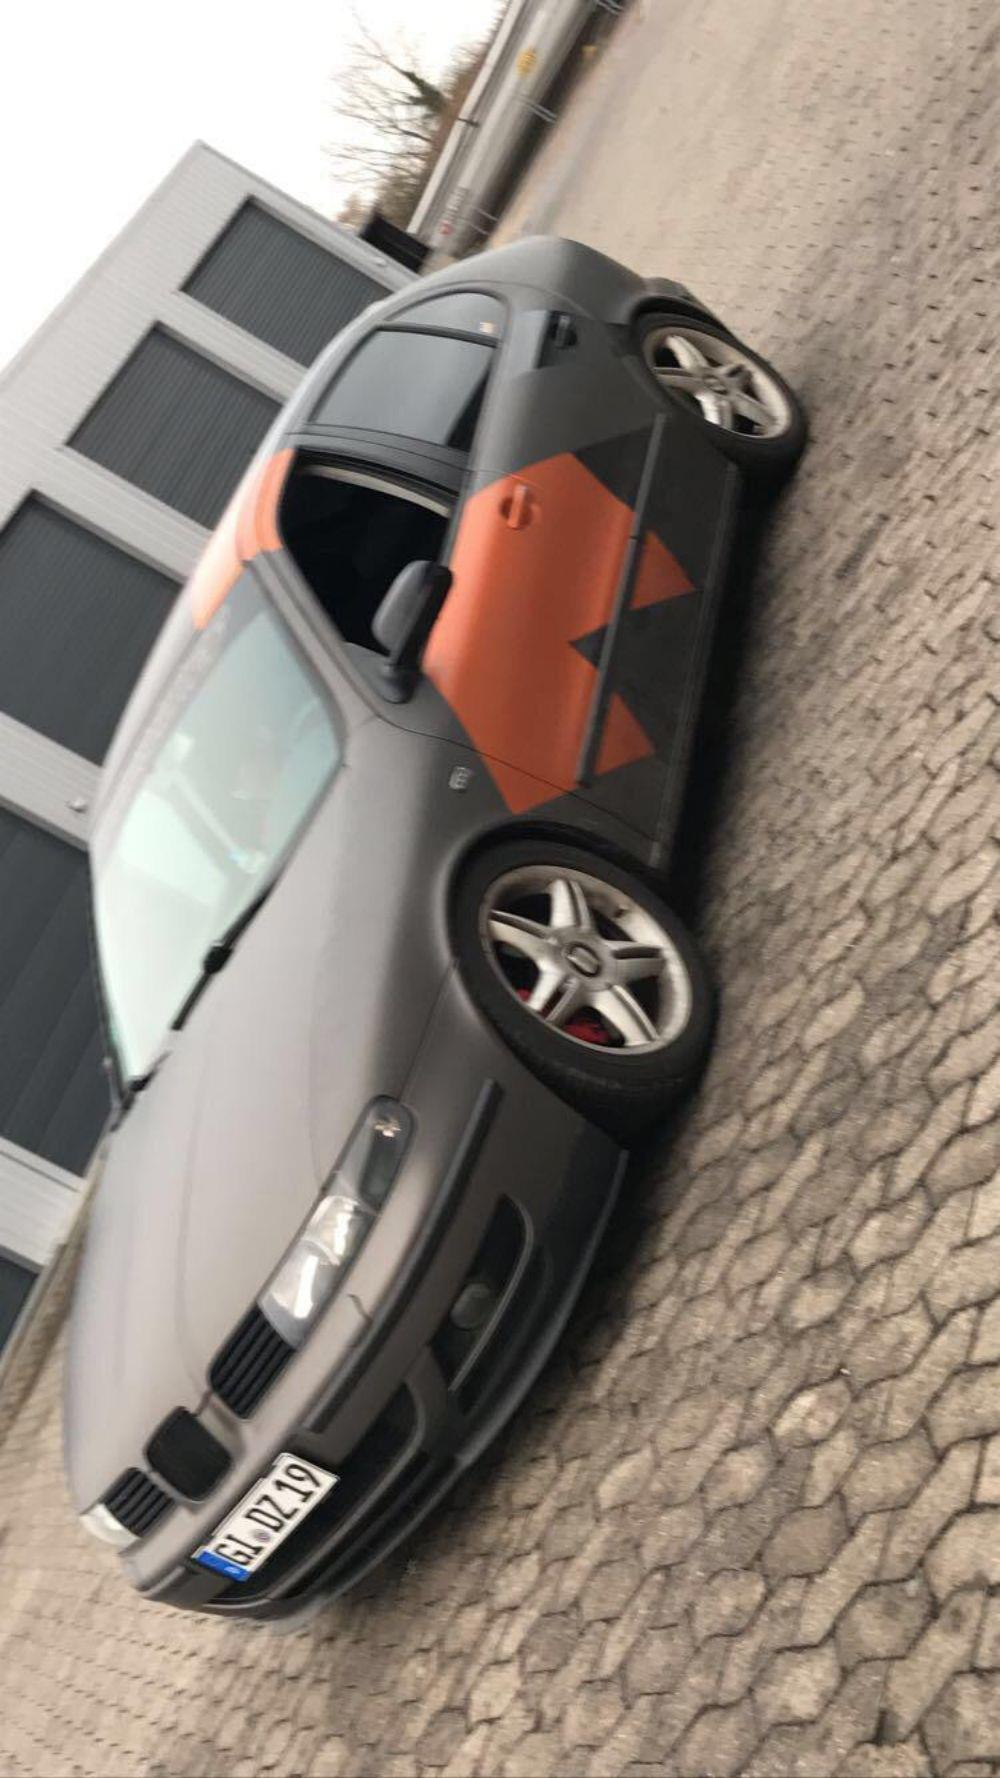 Seat leon 1.8 turbo - imagine 1